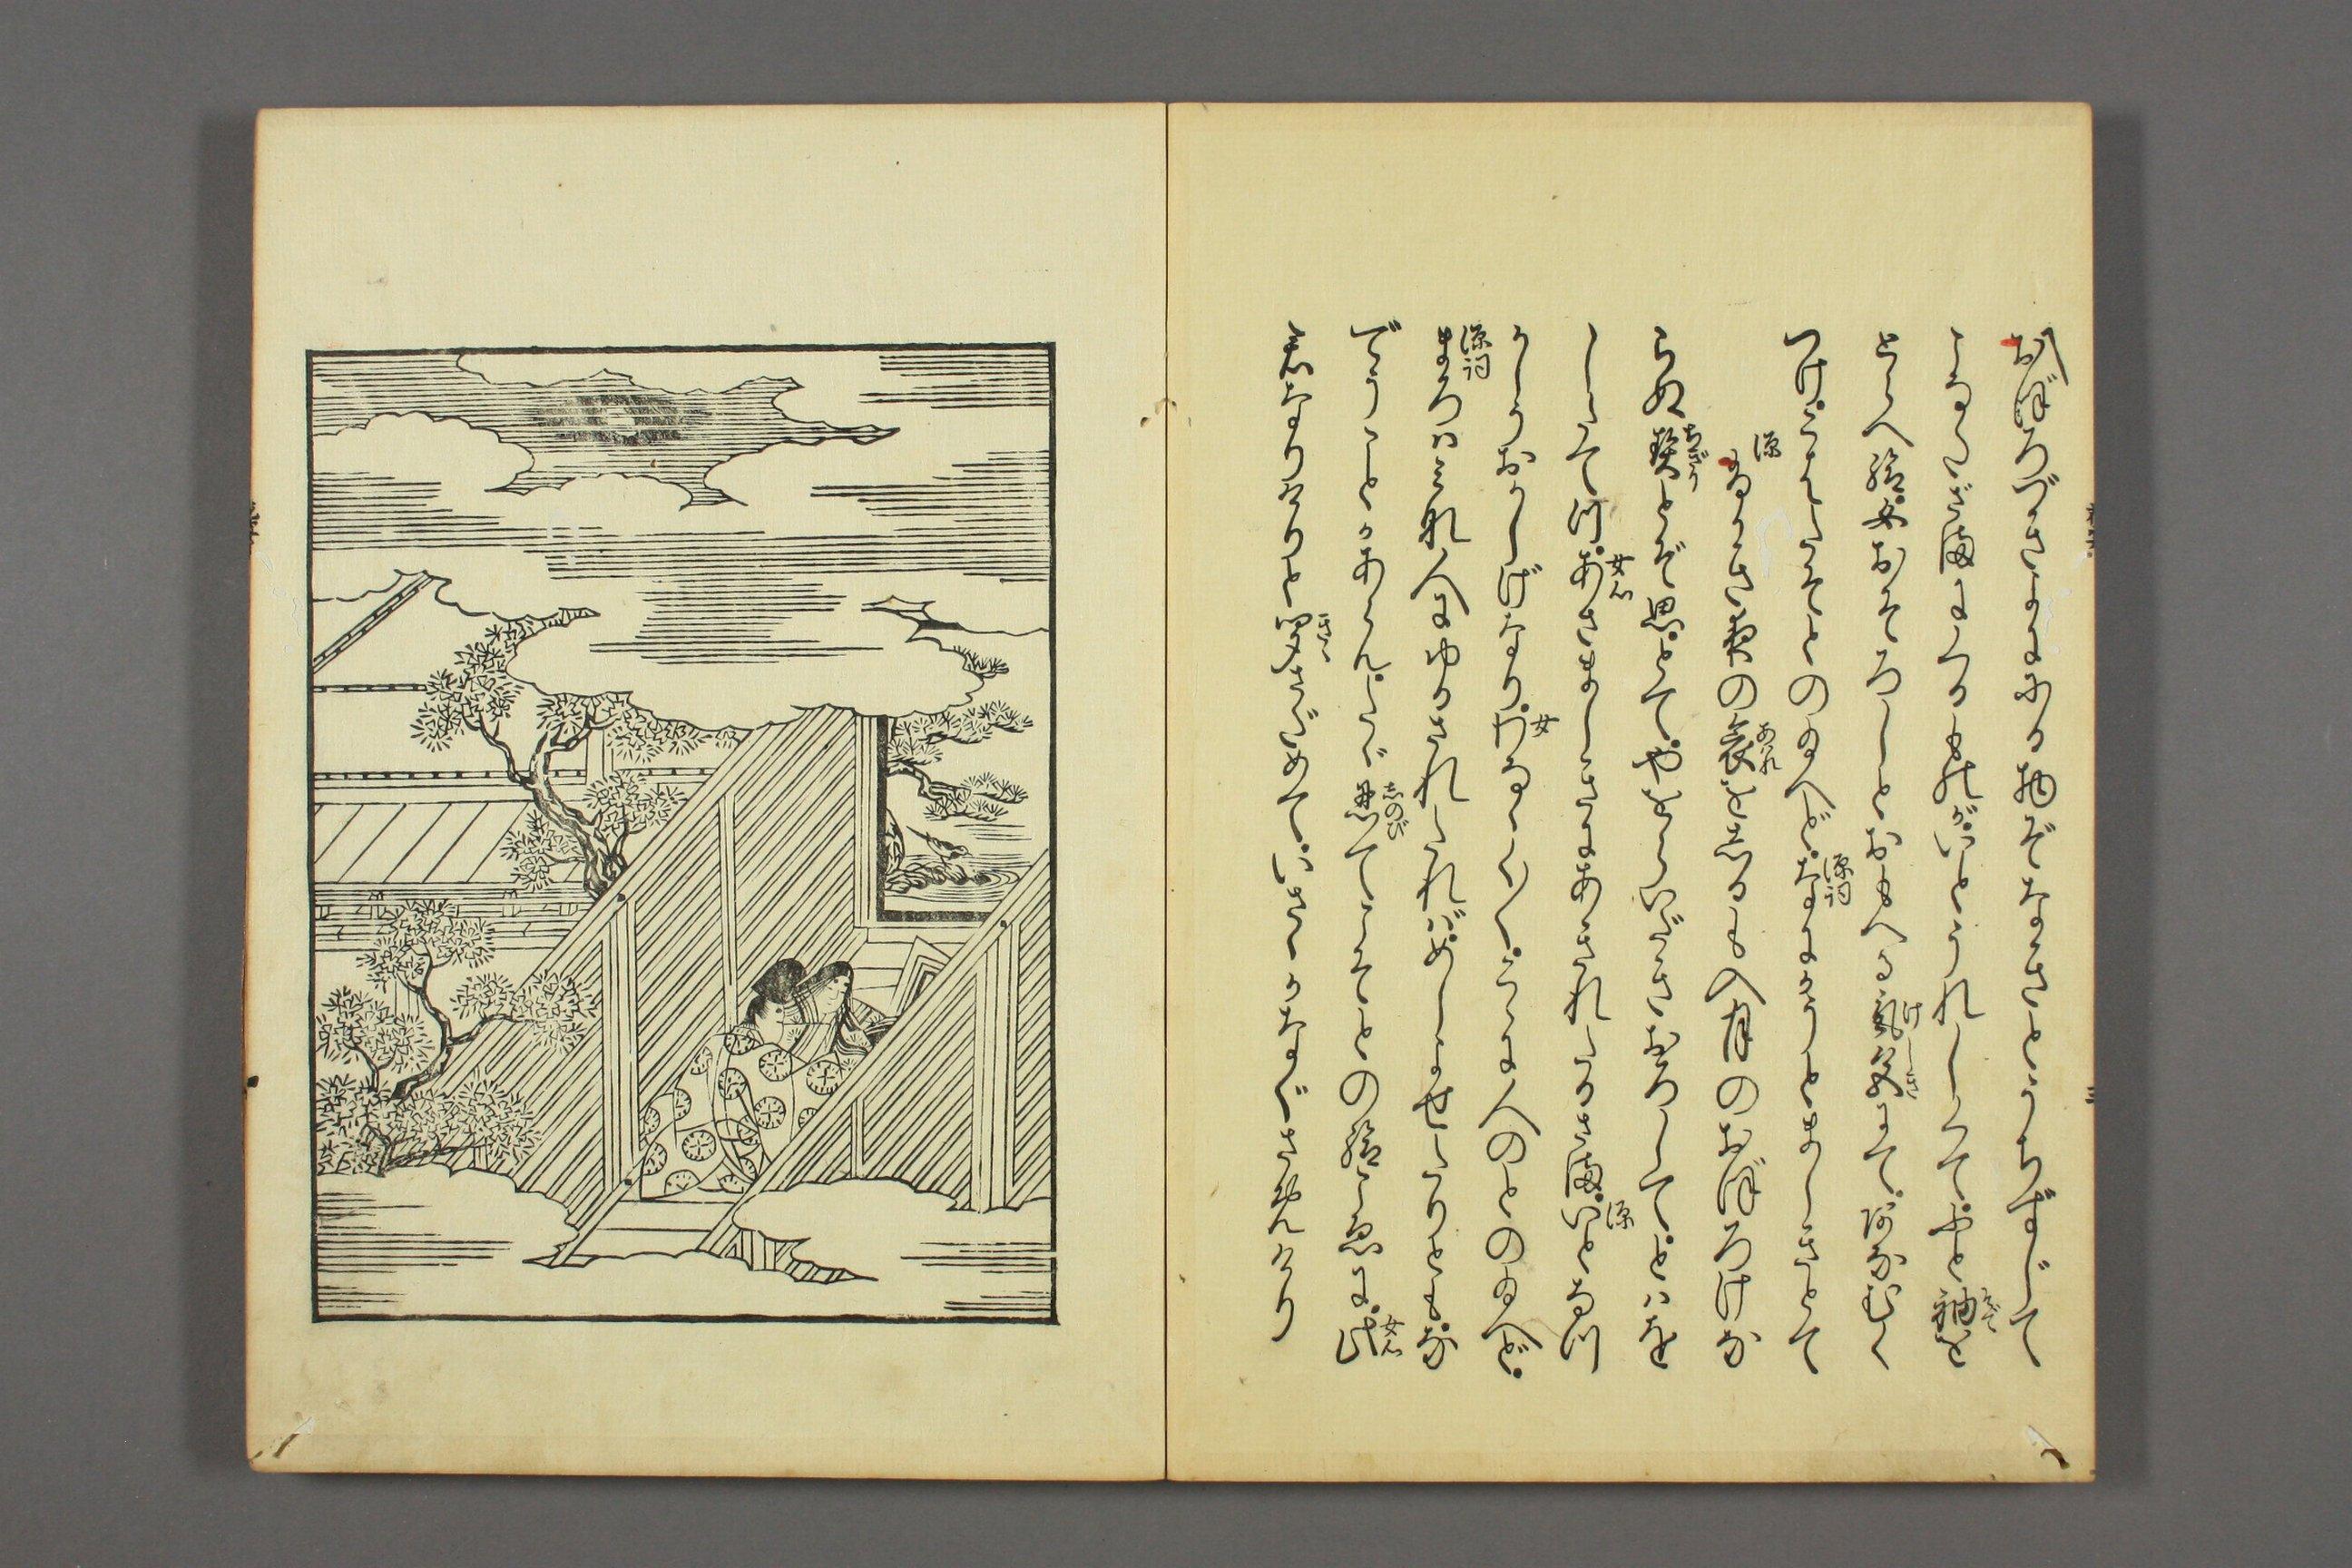 http://archive.wul.waseda.ac.jp/kosho/bunko30/bunko30_a0007/bunko30_a0007_0008/bunko30_a0007_0008_p0005.jpg